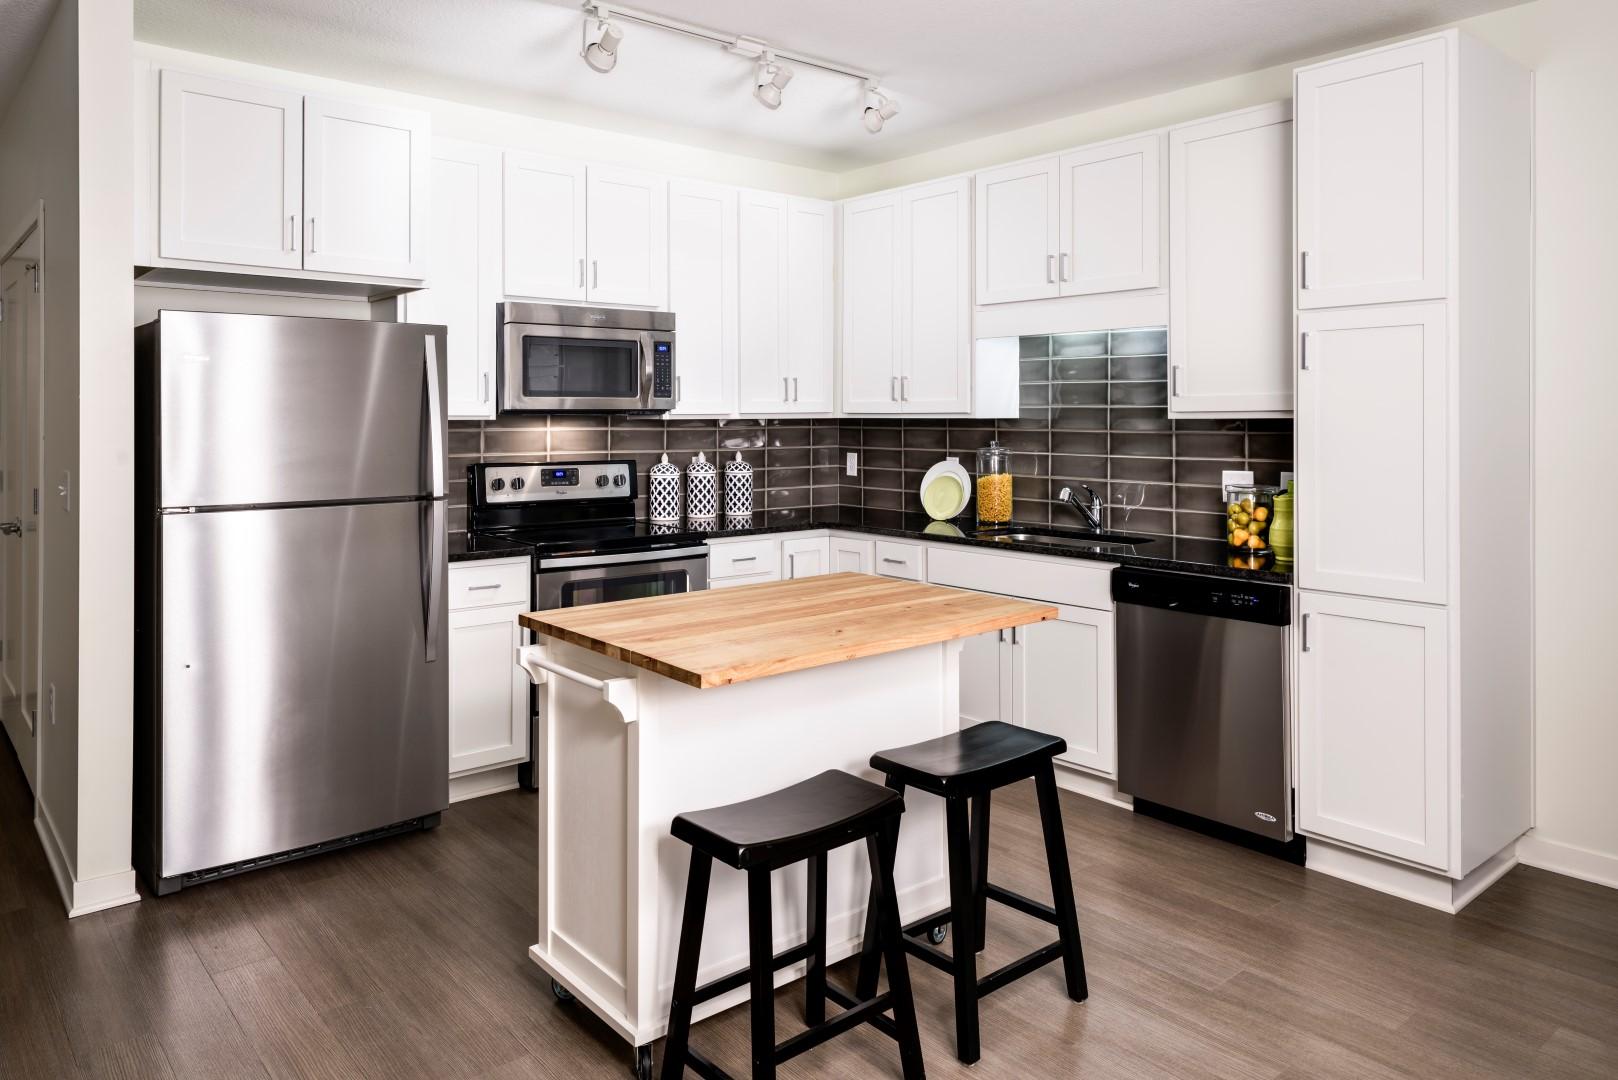 Elements-of-Linden-Hills-Apartment-Minneapolis-Minnesota-Interior8 (Large).jpg